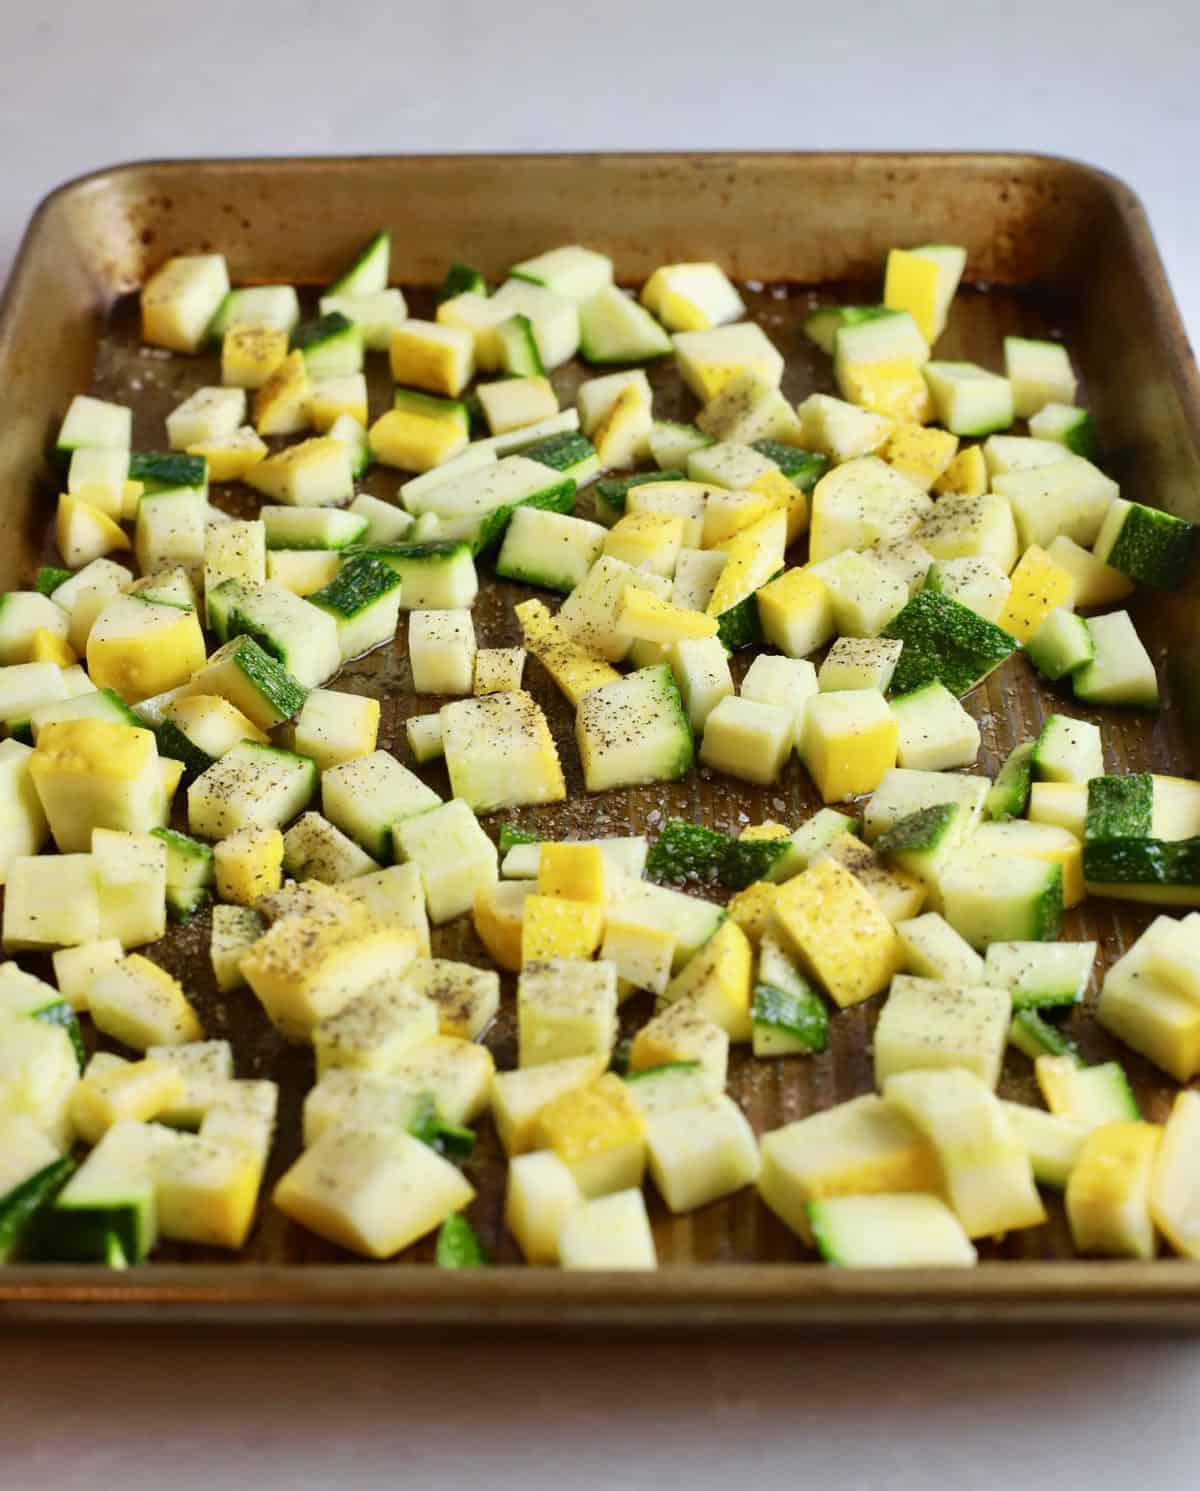 Chopped yellow and zucchini squash on a baking sheet.